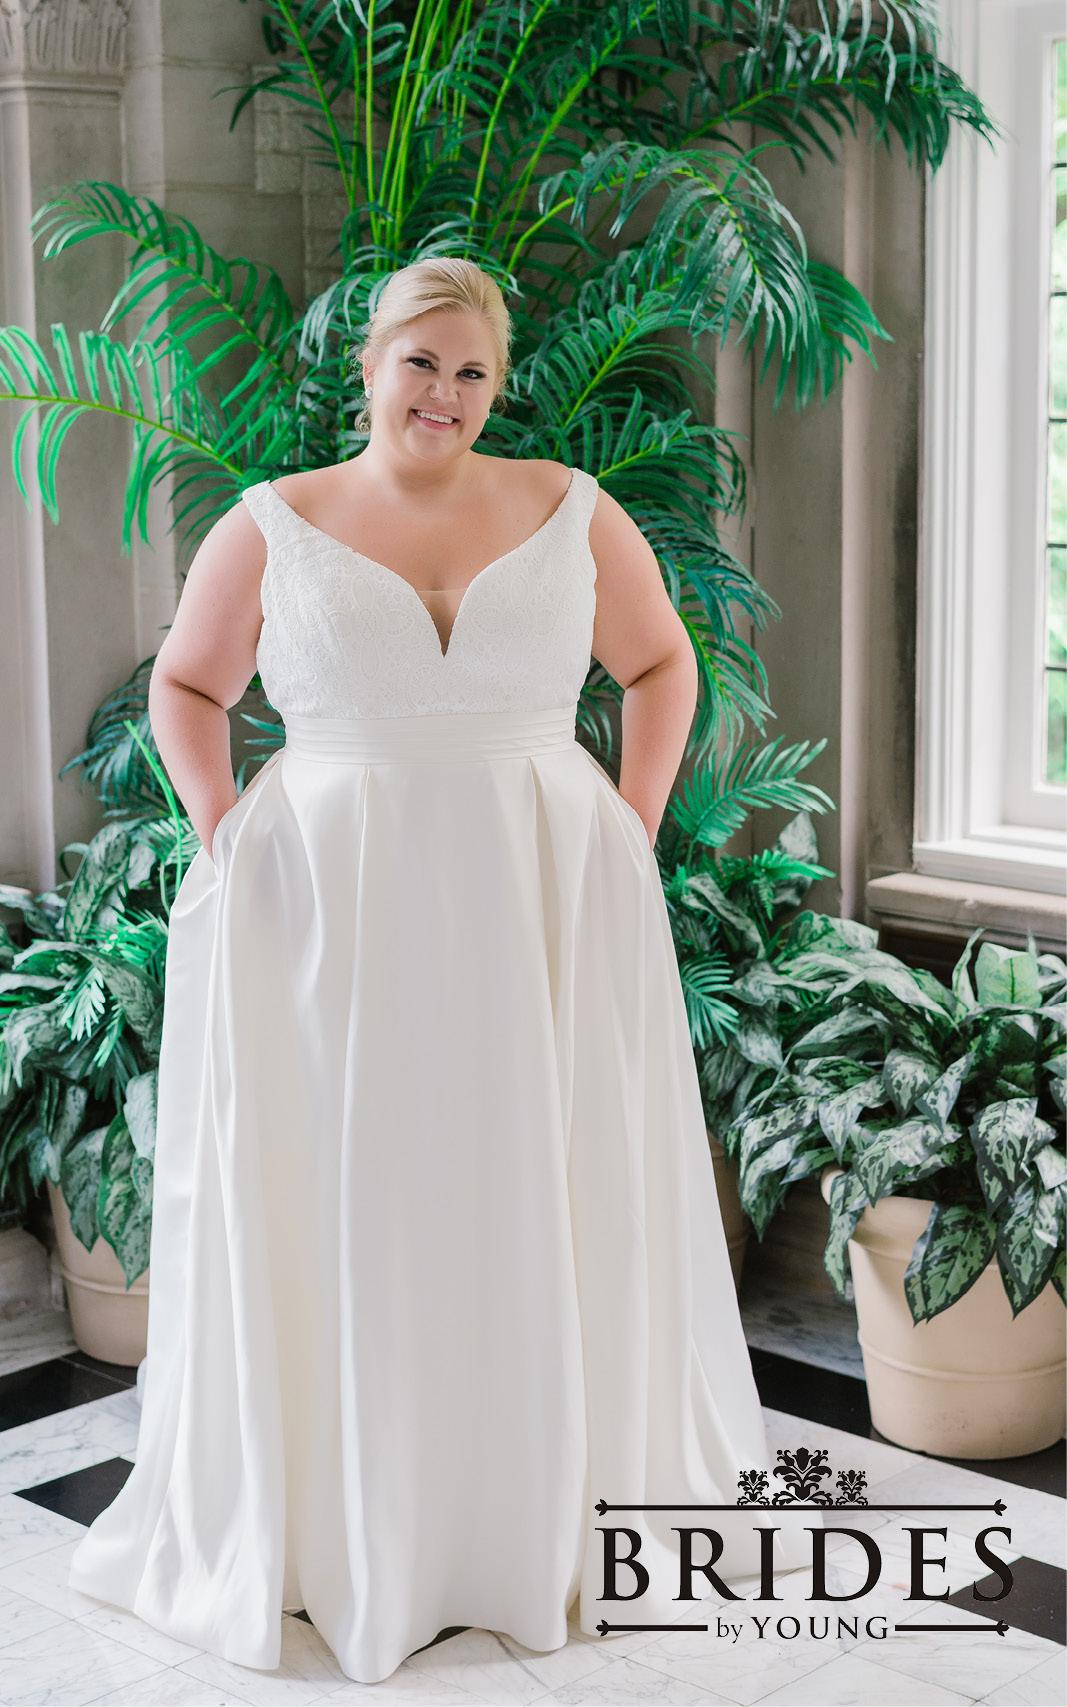 BridesbyYoung-2020Collection-PlusSizeBridalBoutique-CurvyWeddingDressInspiration-168.jpg